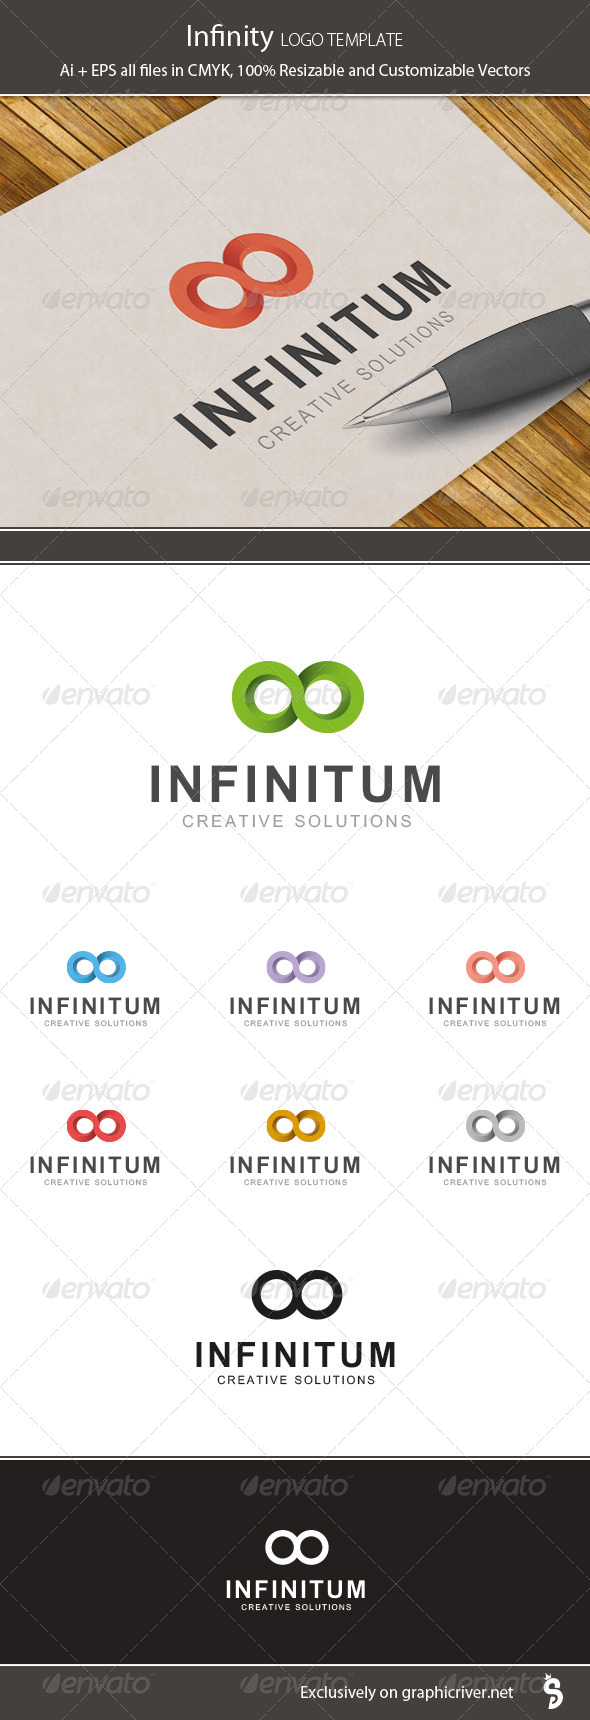 GraphicRiver Infinity Logo Template 7170686